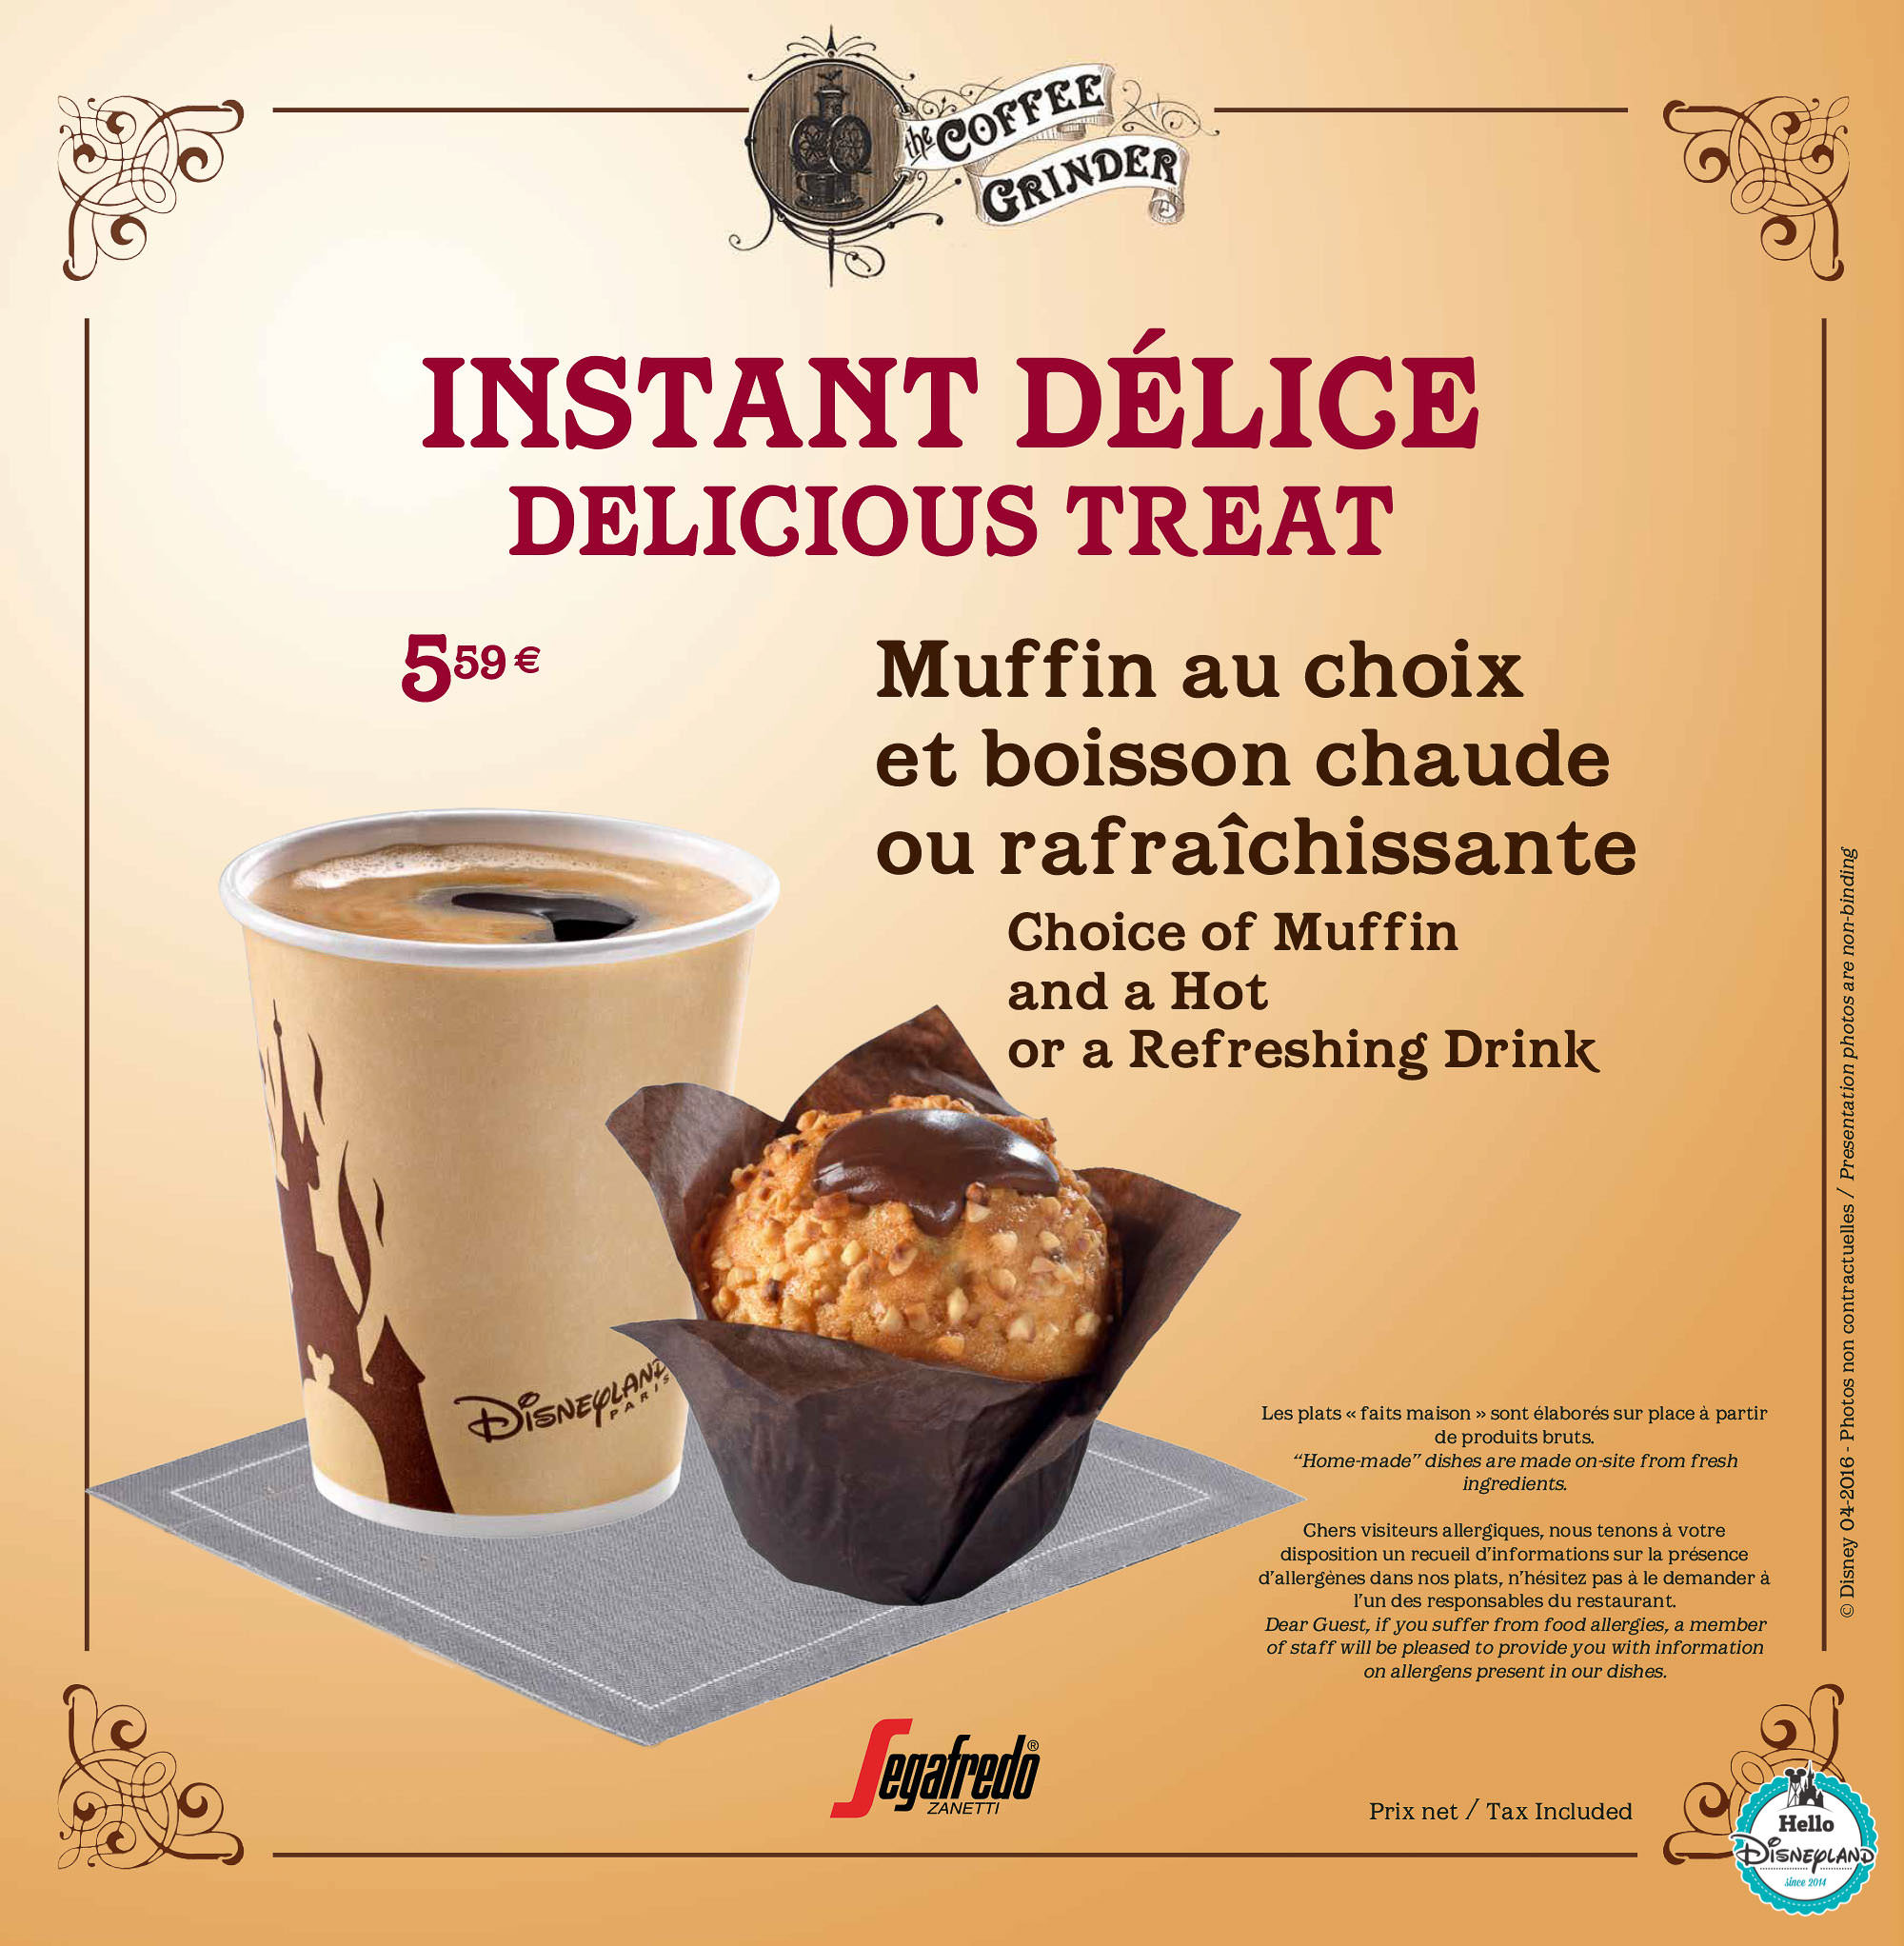 Disneyland-Paris-restaurant-menu-2016-Coffee-grinder-avril-2016-2